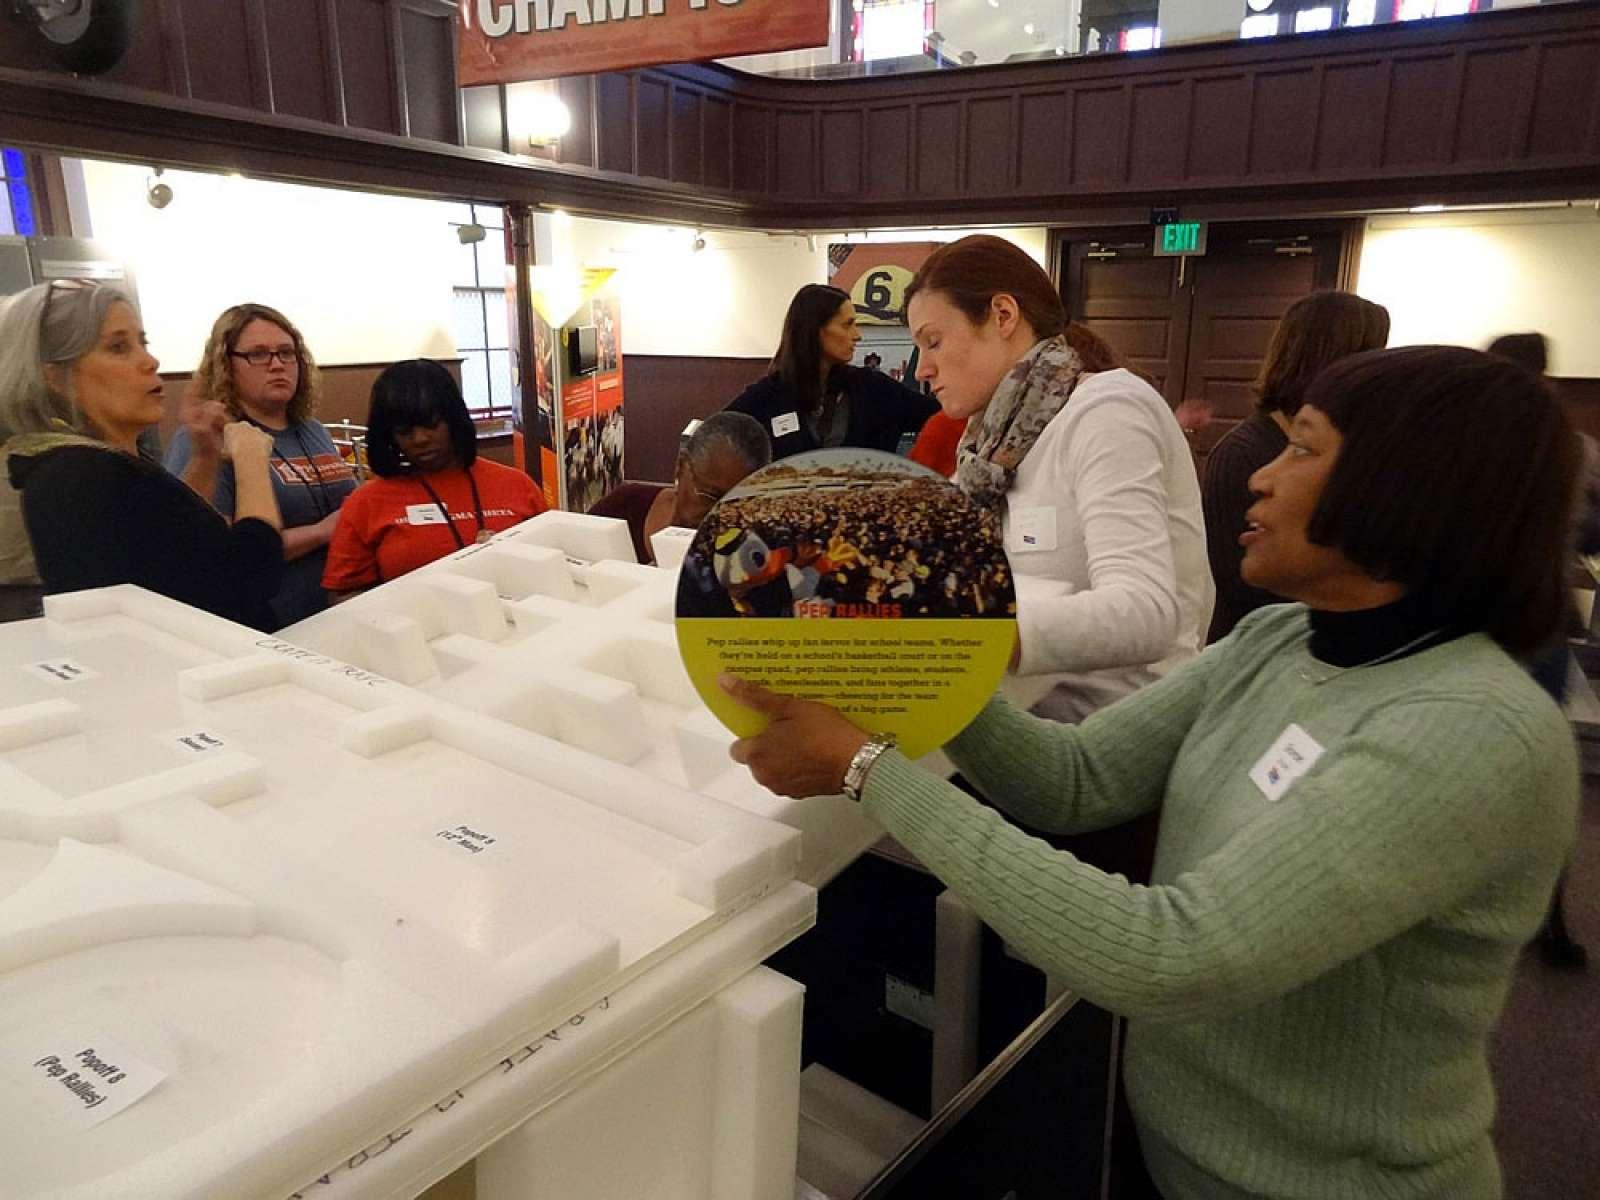 unpacking crates - Banneker-Douglass Museum, Maryland, 2015